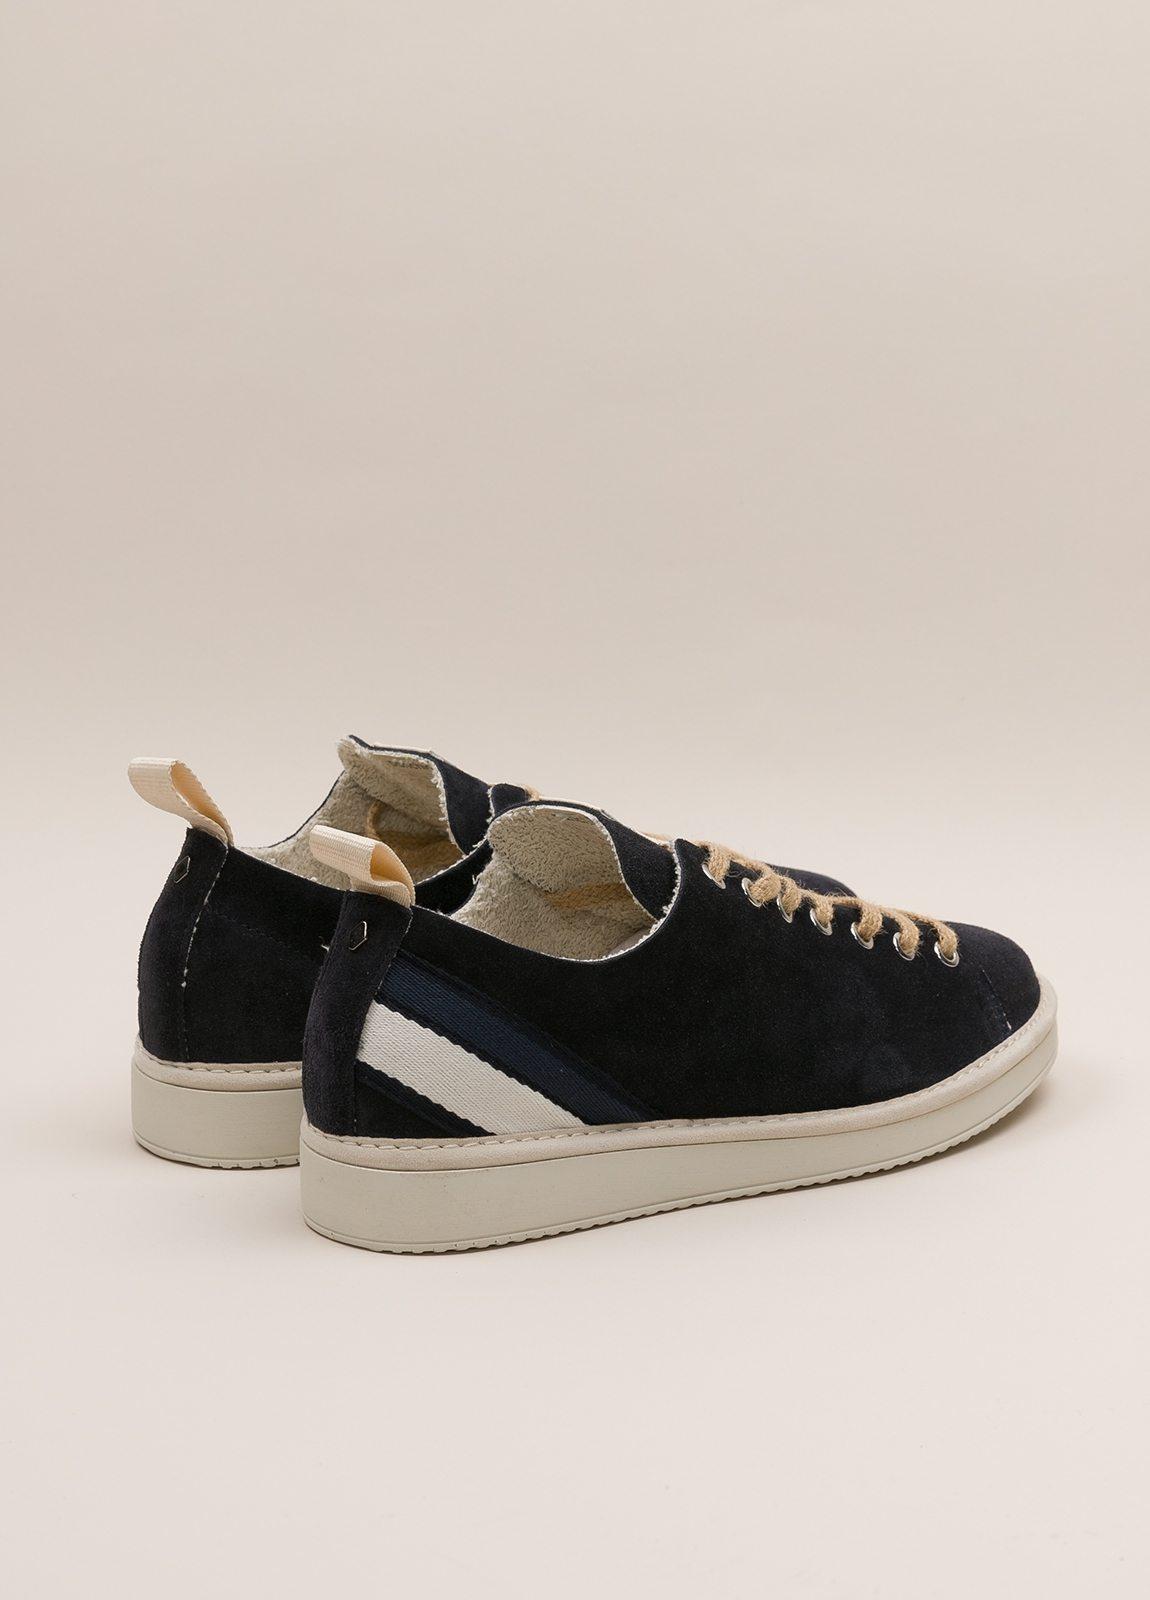 Sneakers PANCHIC marino - Ítem4